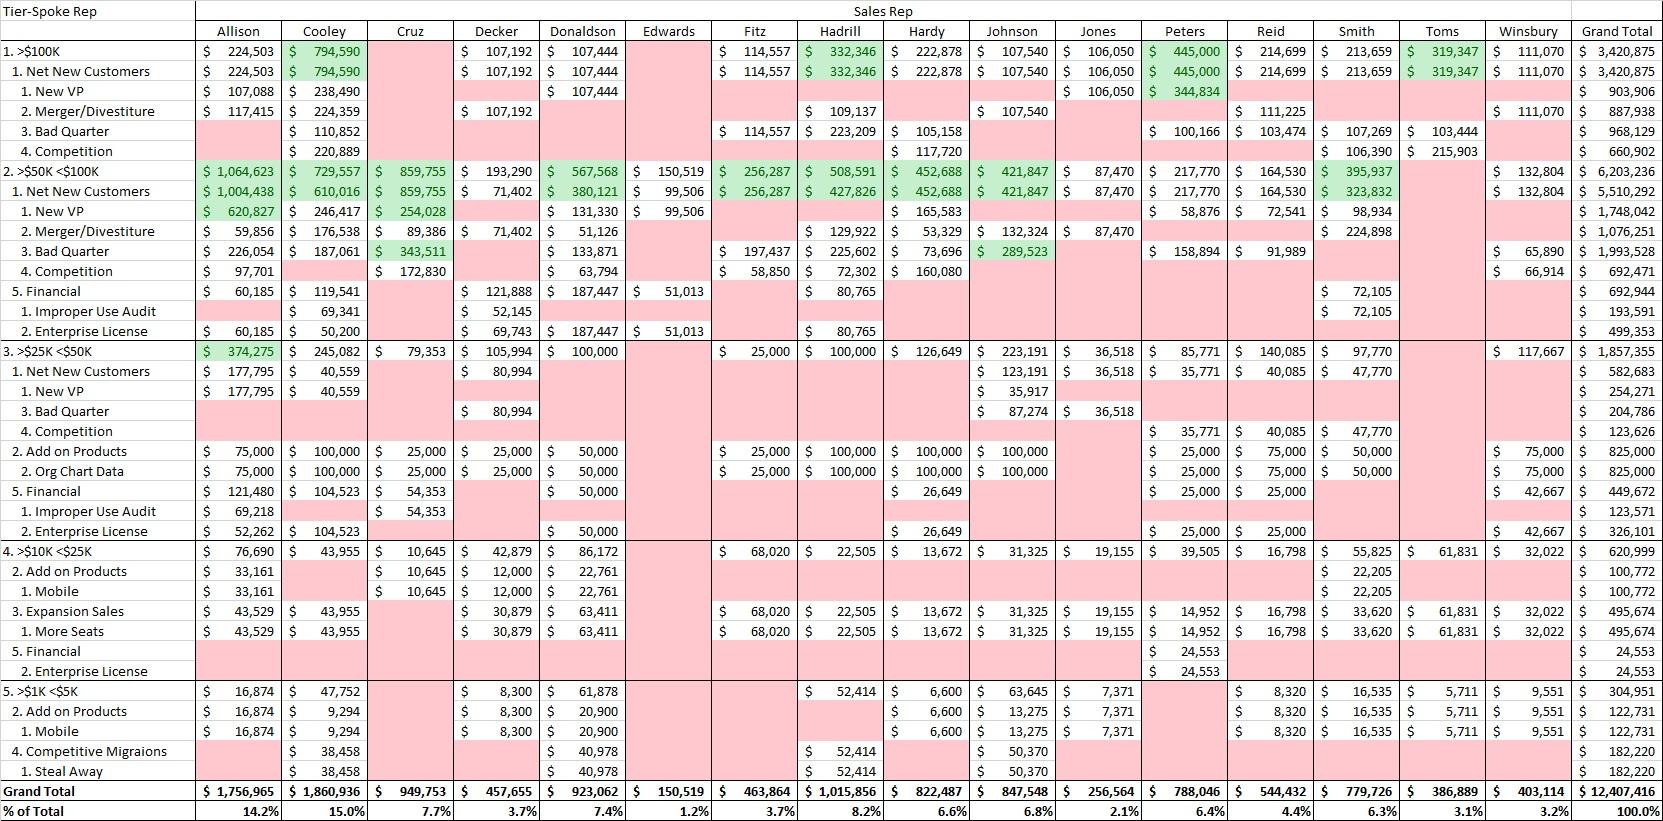 MoneyWheel Category-Spoke-Tier-Sales Rep